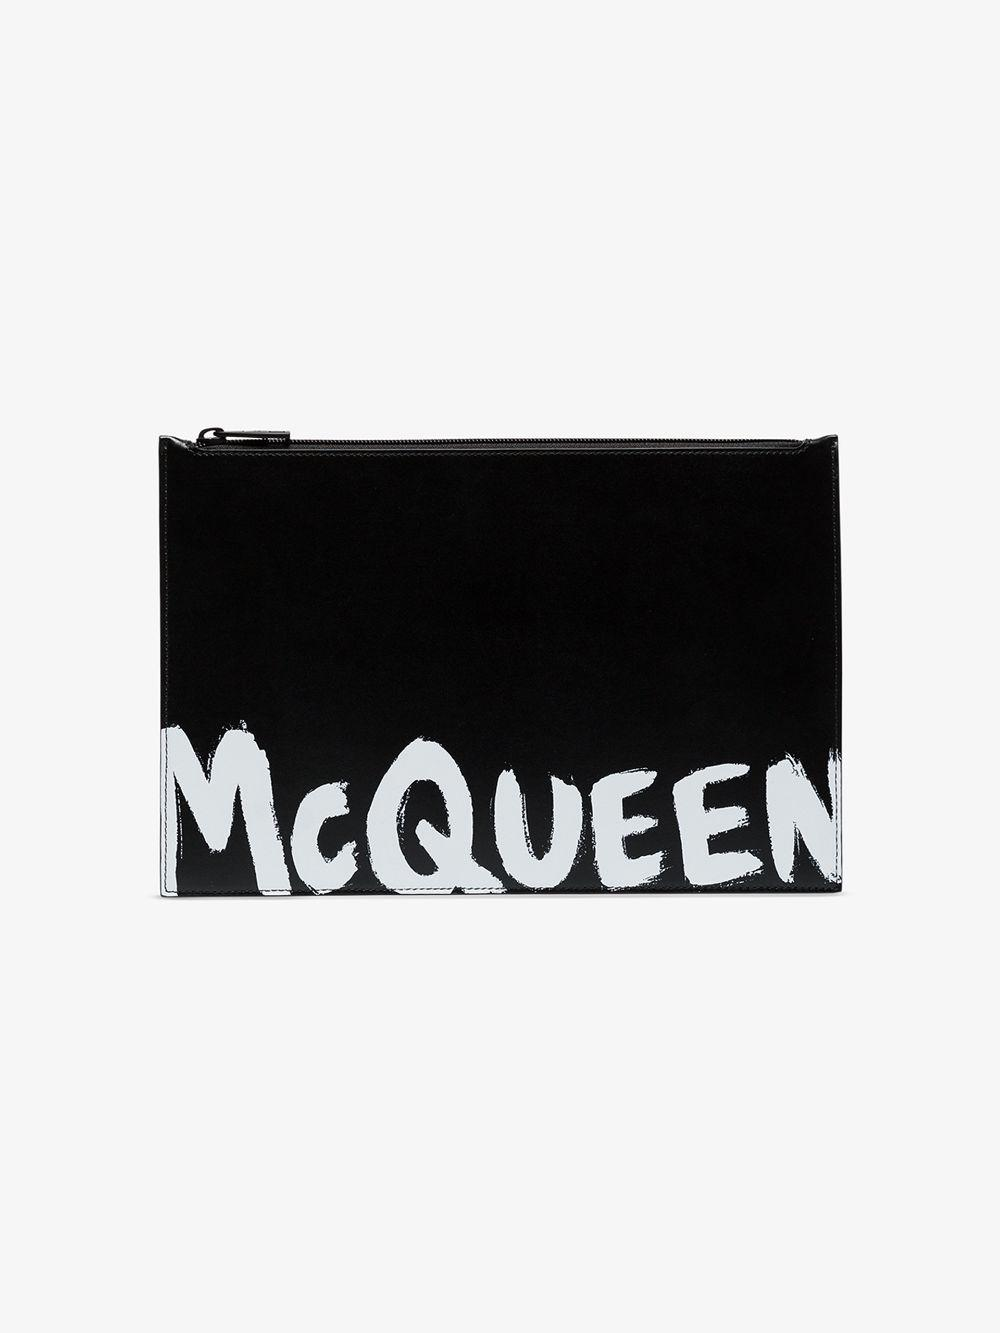 NEW DOLCE /& GABBANA Handkerchief Black Silk Pochette Square Pocket 30cm x 30cm